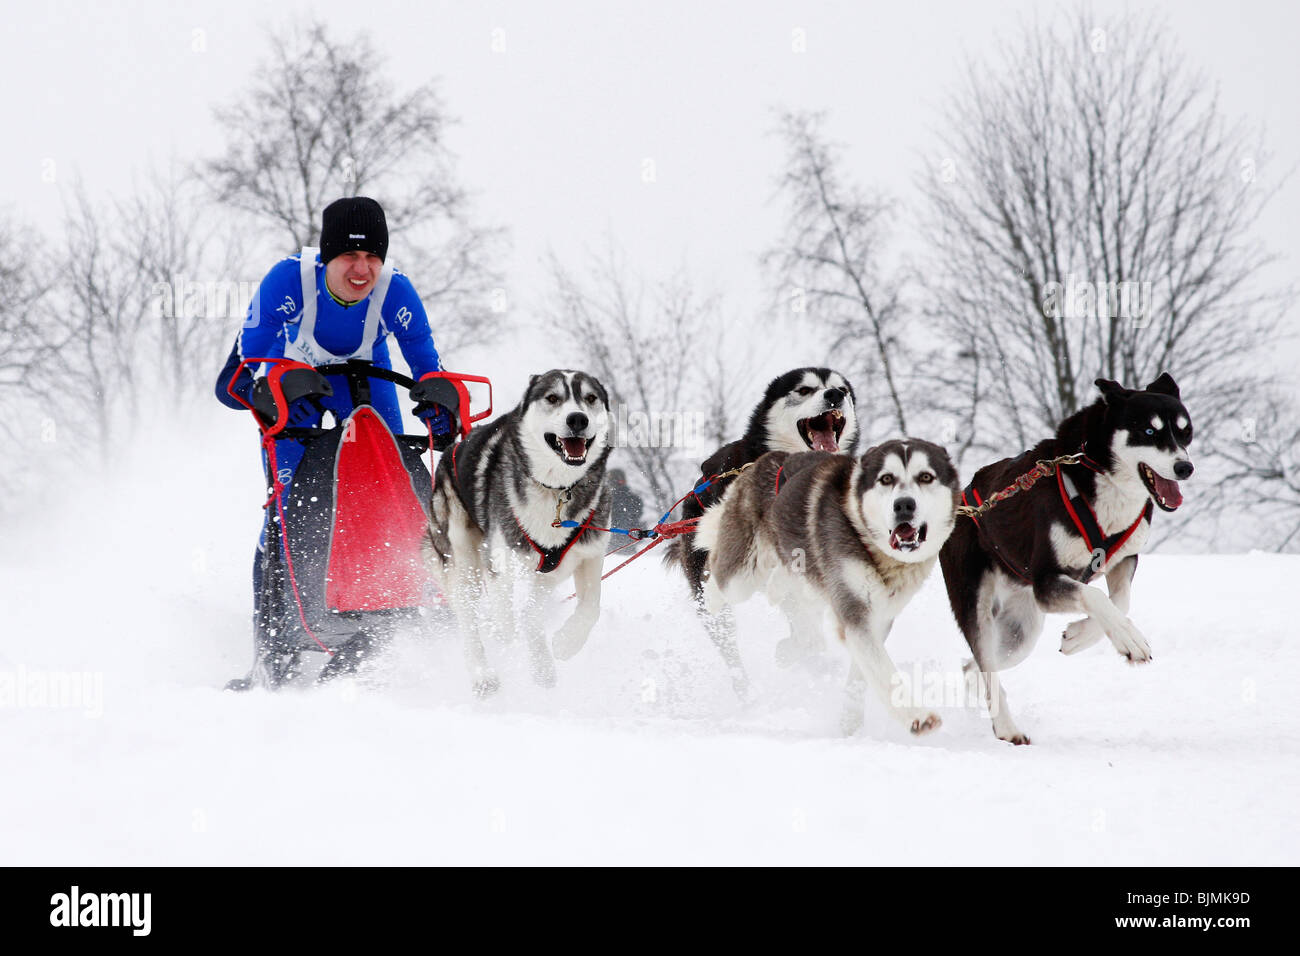 Siberian Huskies, Winterberg Sled Dog Races 2010, Sauerland, North Rhine-Westphalia, Germany, Europe - Stock Image